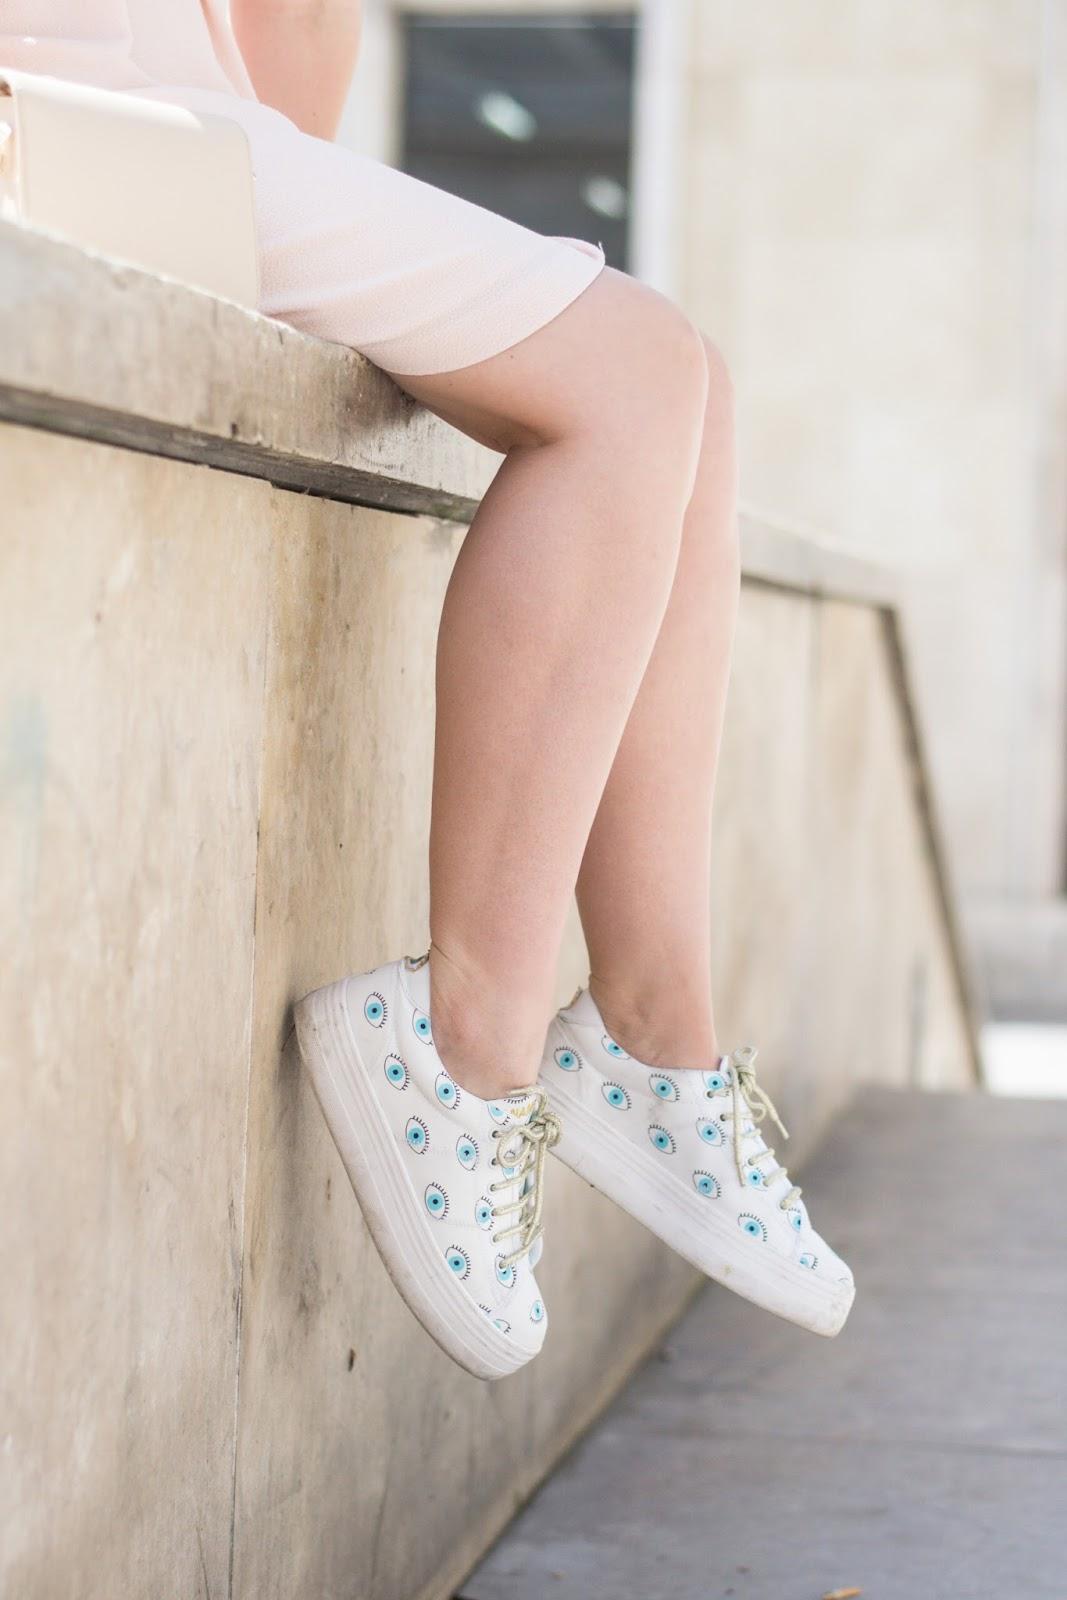 Style-parisianfashionblogger-streetstyle-cutestyle-paris-pink